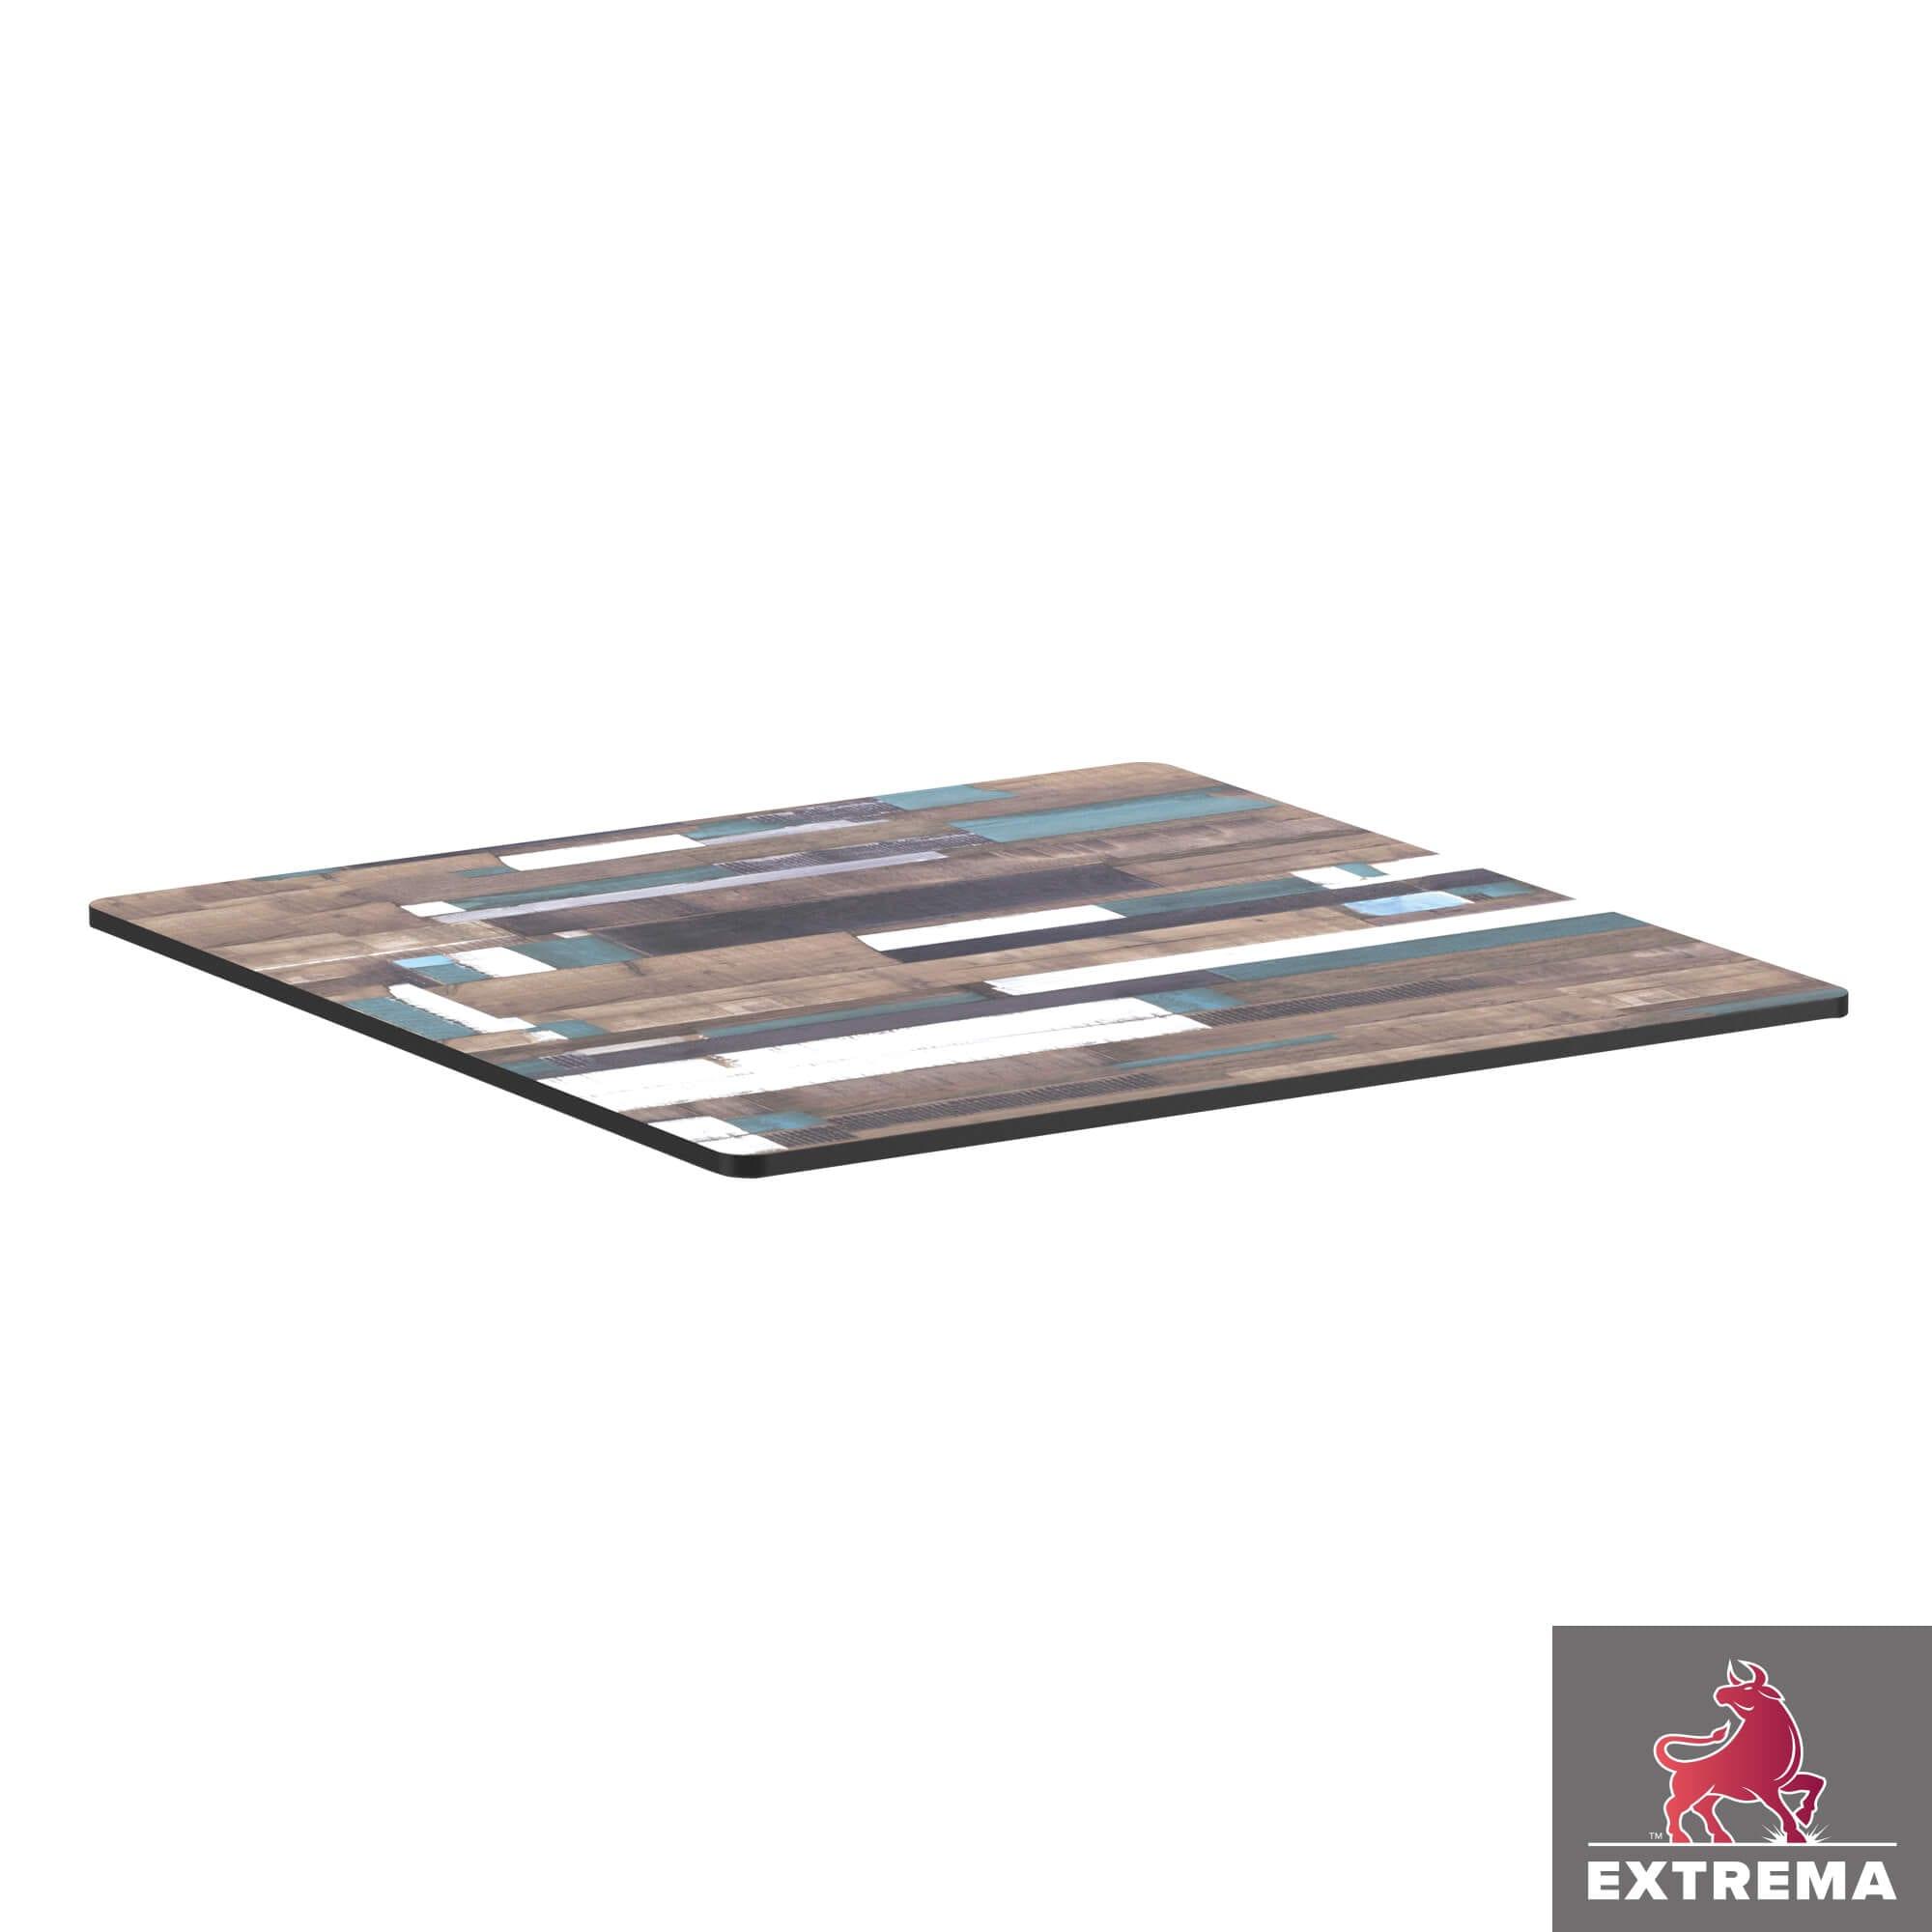 Erman Driftwood - Full Table - 60x60 - Poseur